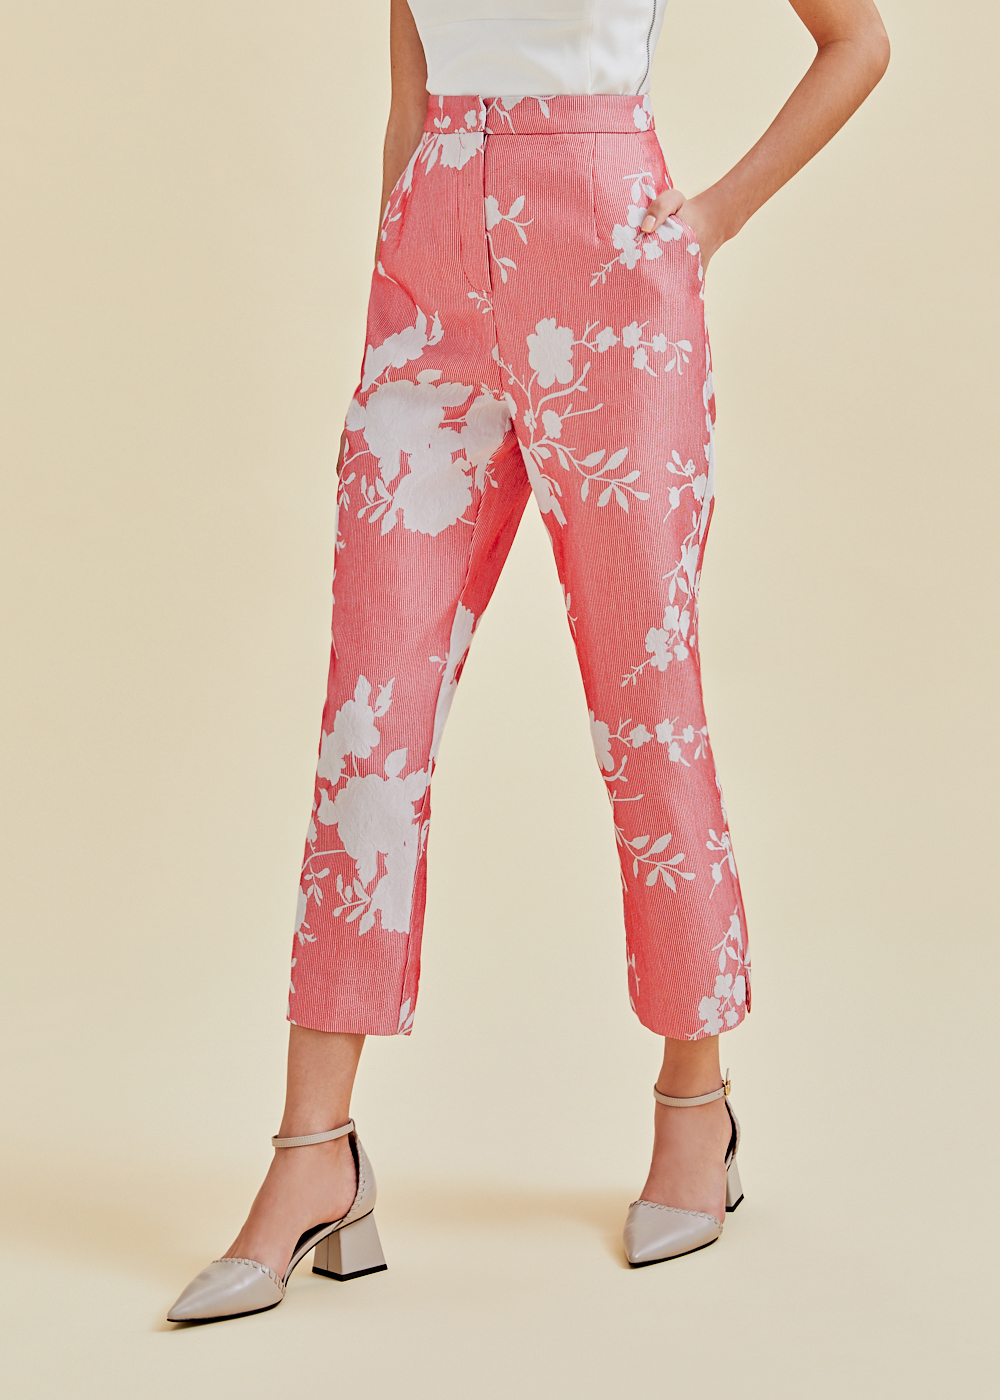 Aerith Floral Jacquard Peg Leg Pants